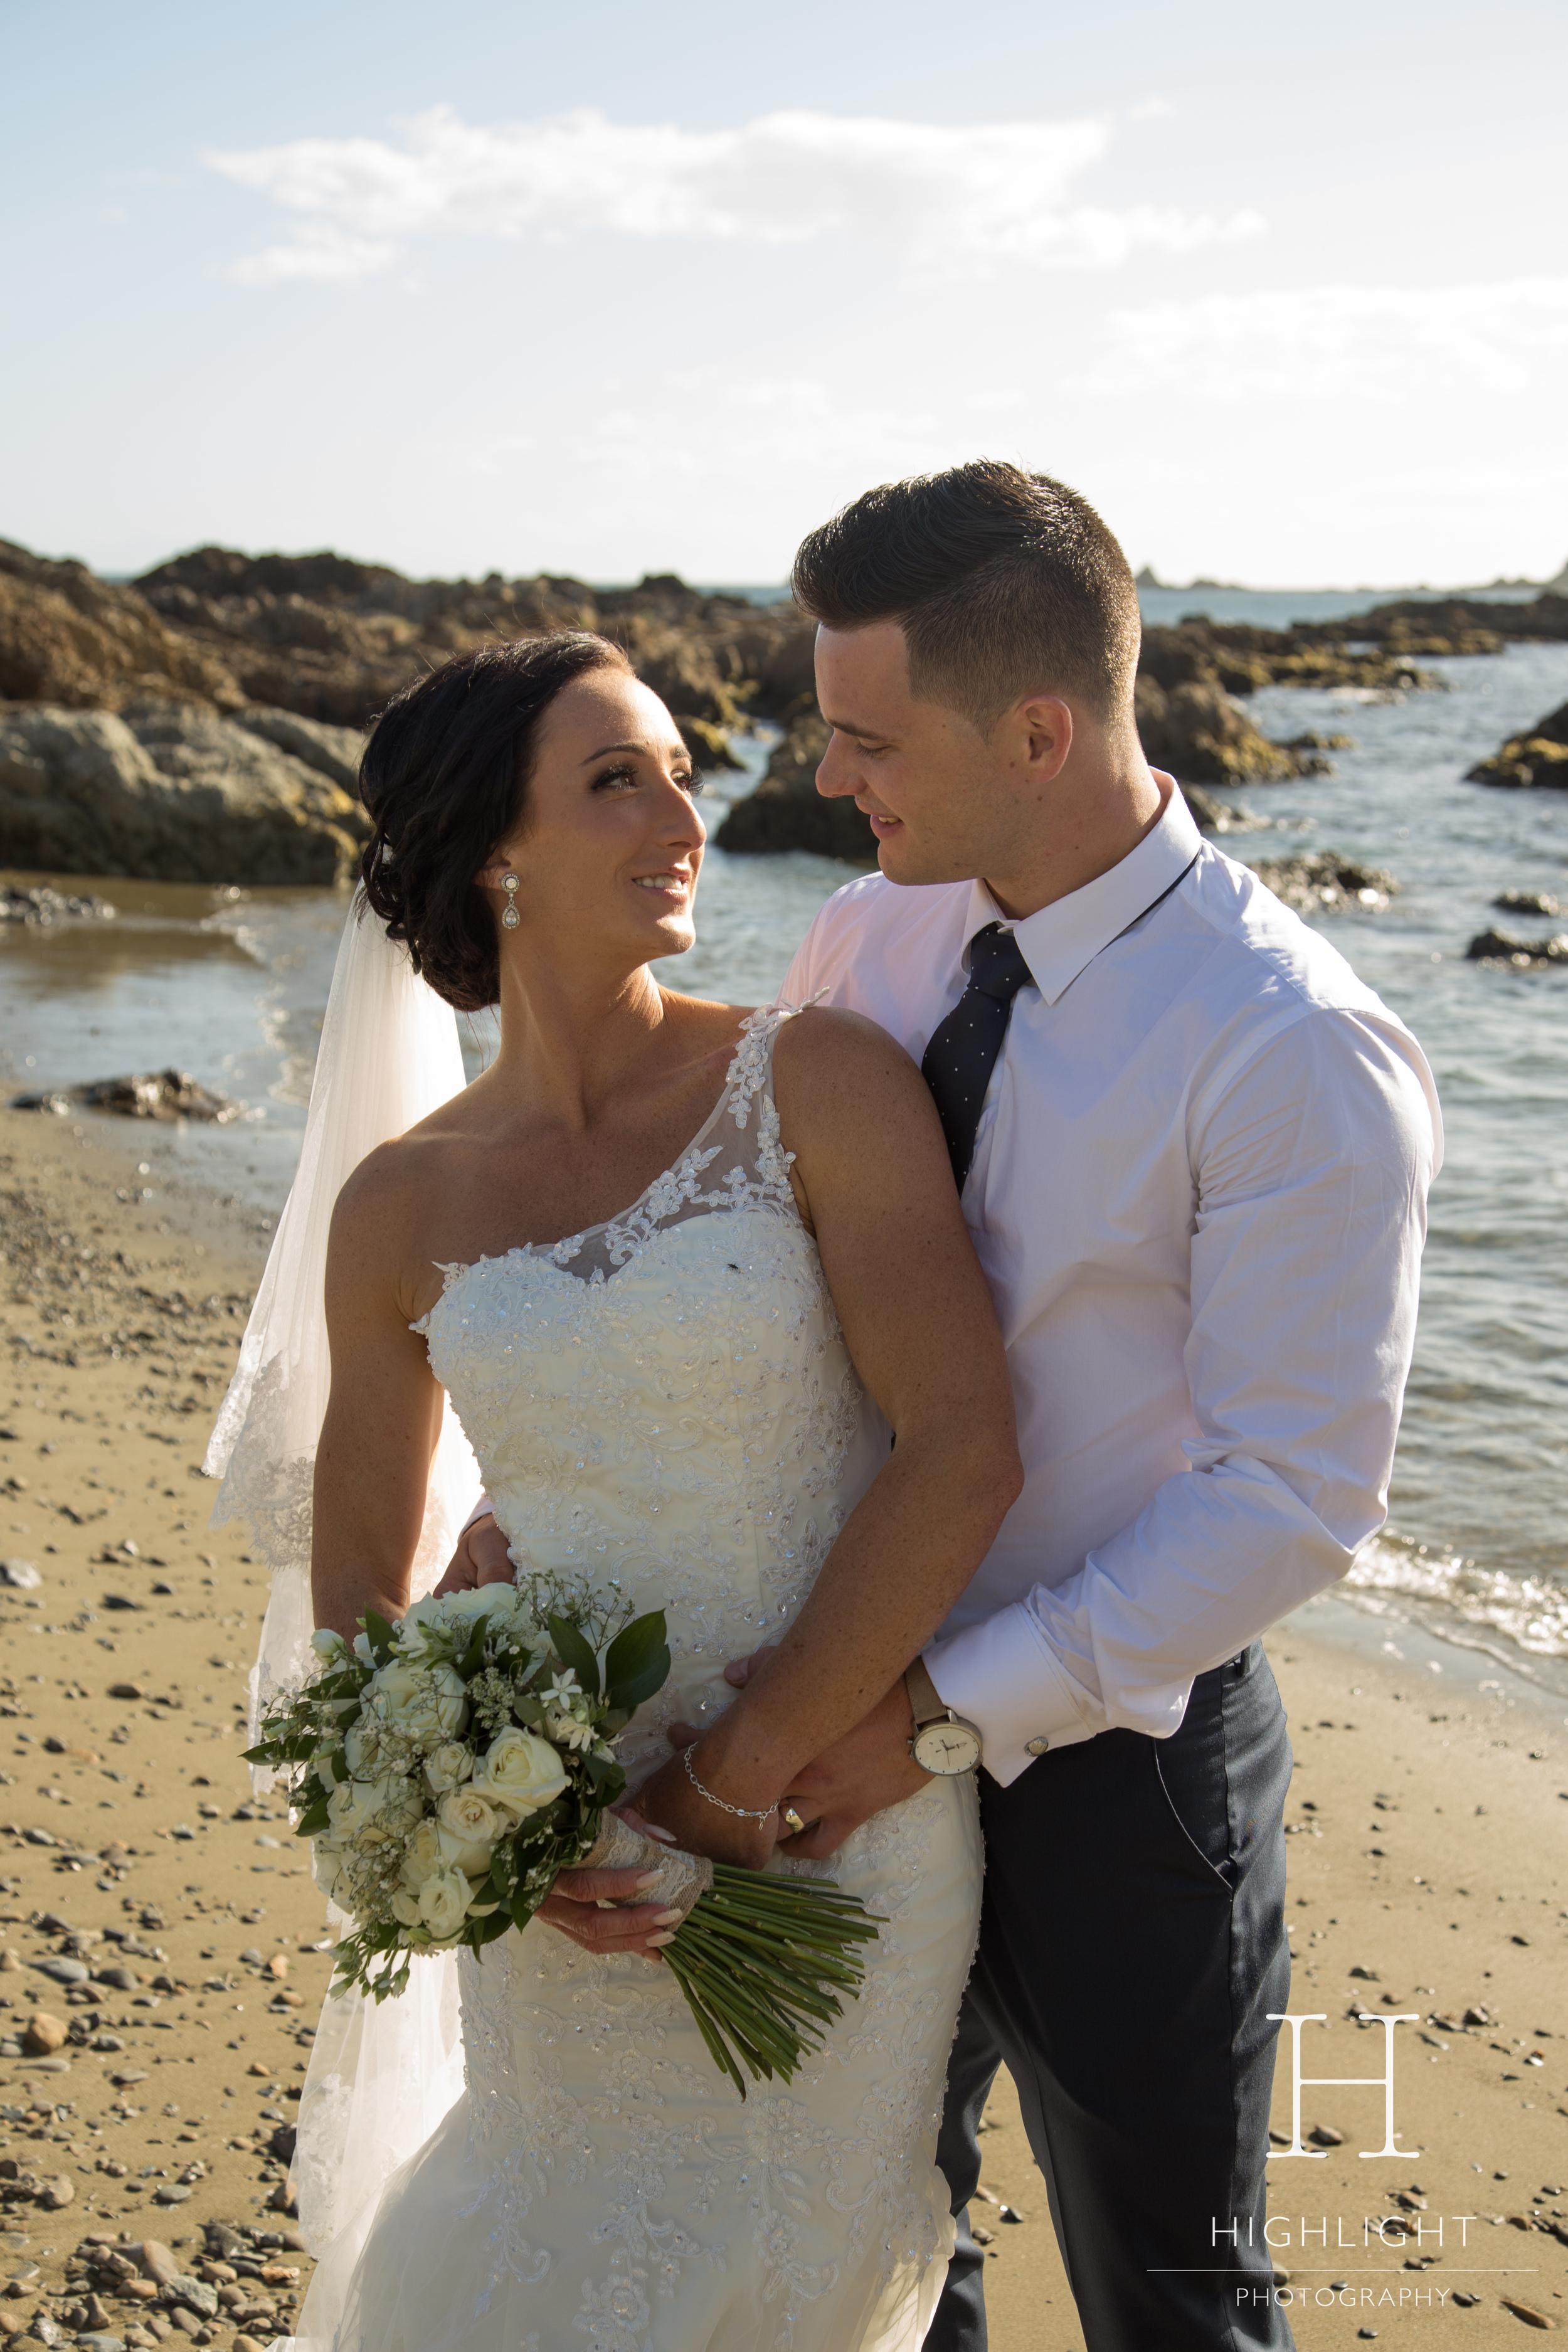 highlight_kc_beach_wellington_wedding_love.jpg